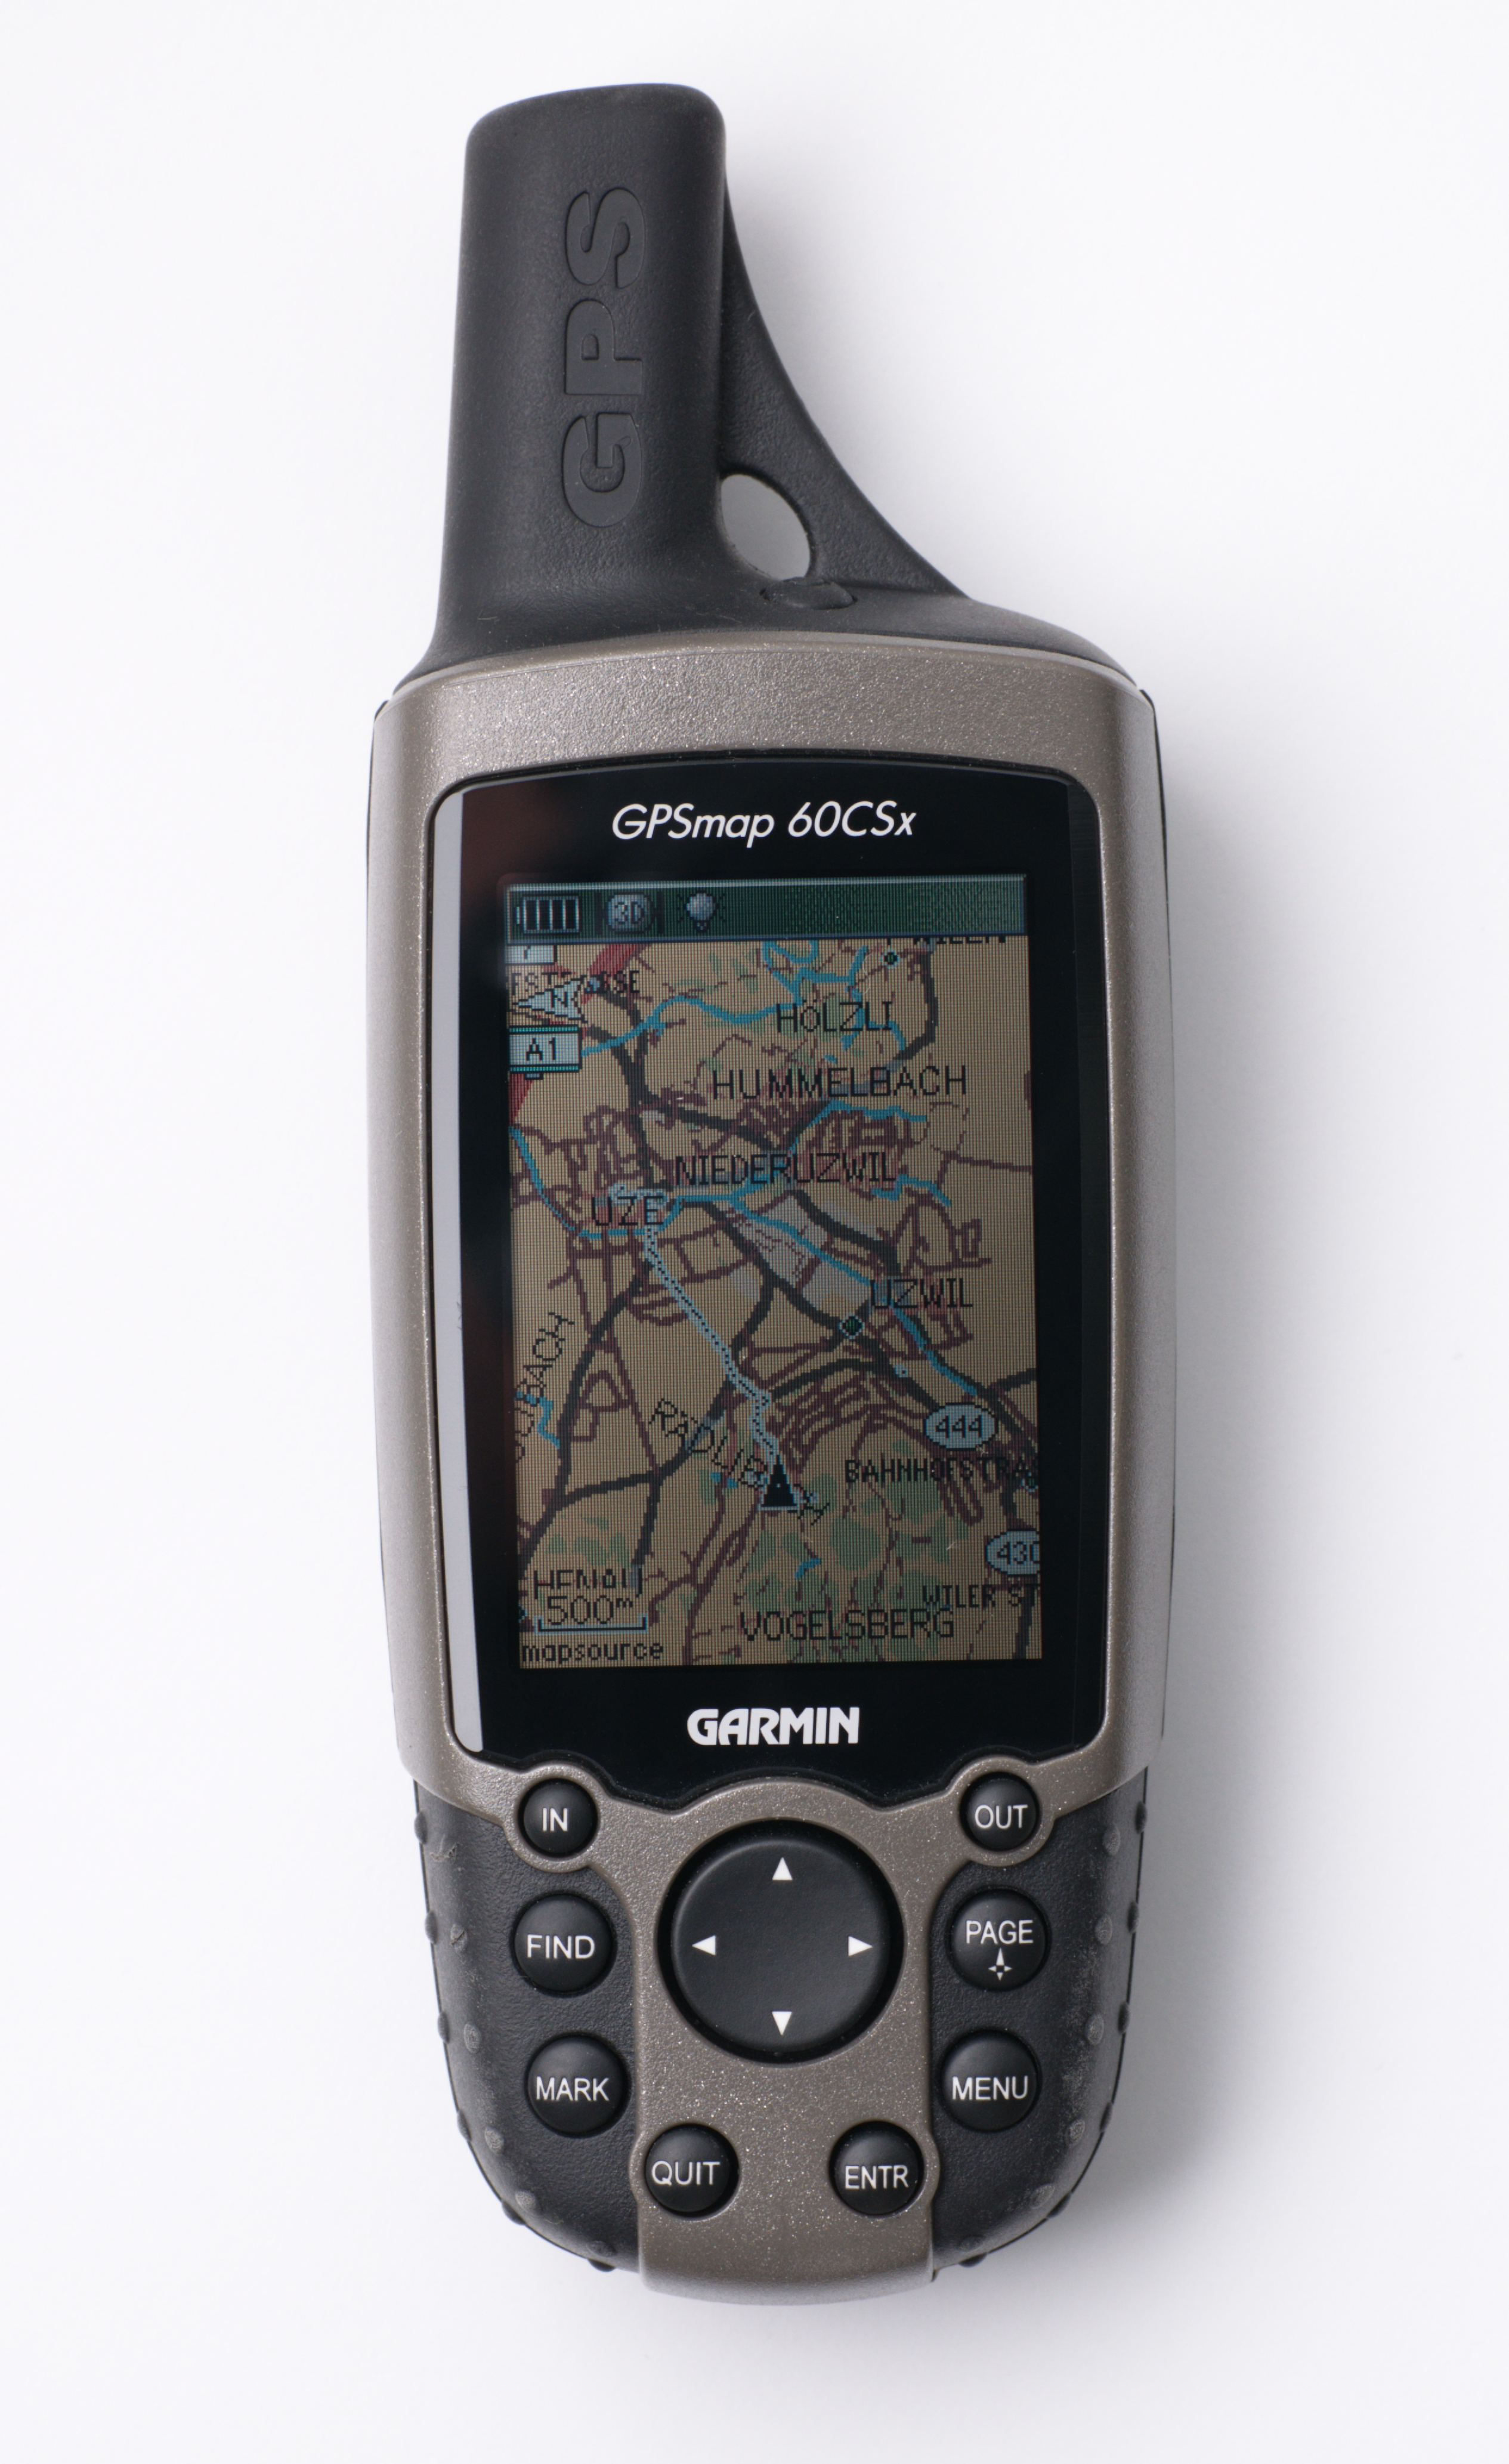 file garmin 60csx jpg wikimedia commons rh commons wikimedia org Garmin GPSMAP 64 Cases Garmin GPSMAP 64s